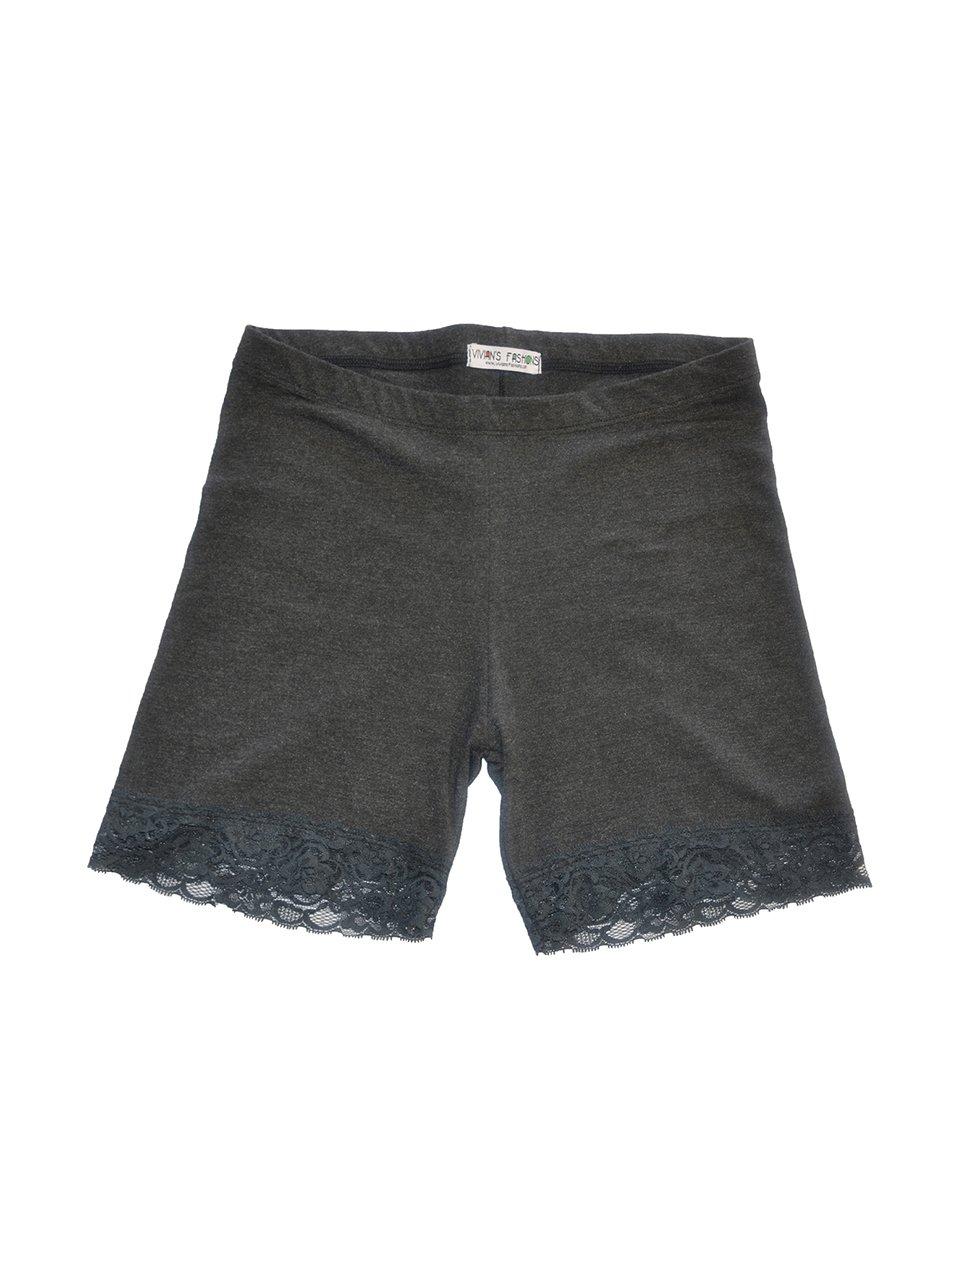 Vivian's Fashions Legging Shorts - Girls, Cotton, Lace Trim (Charcoal, Large)